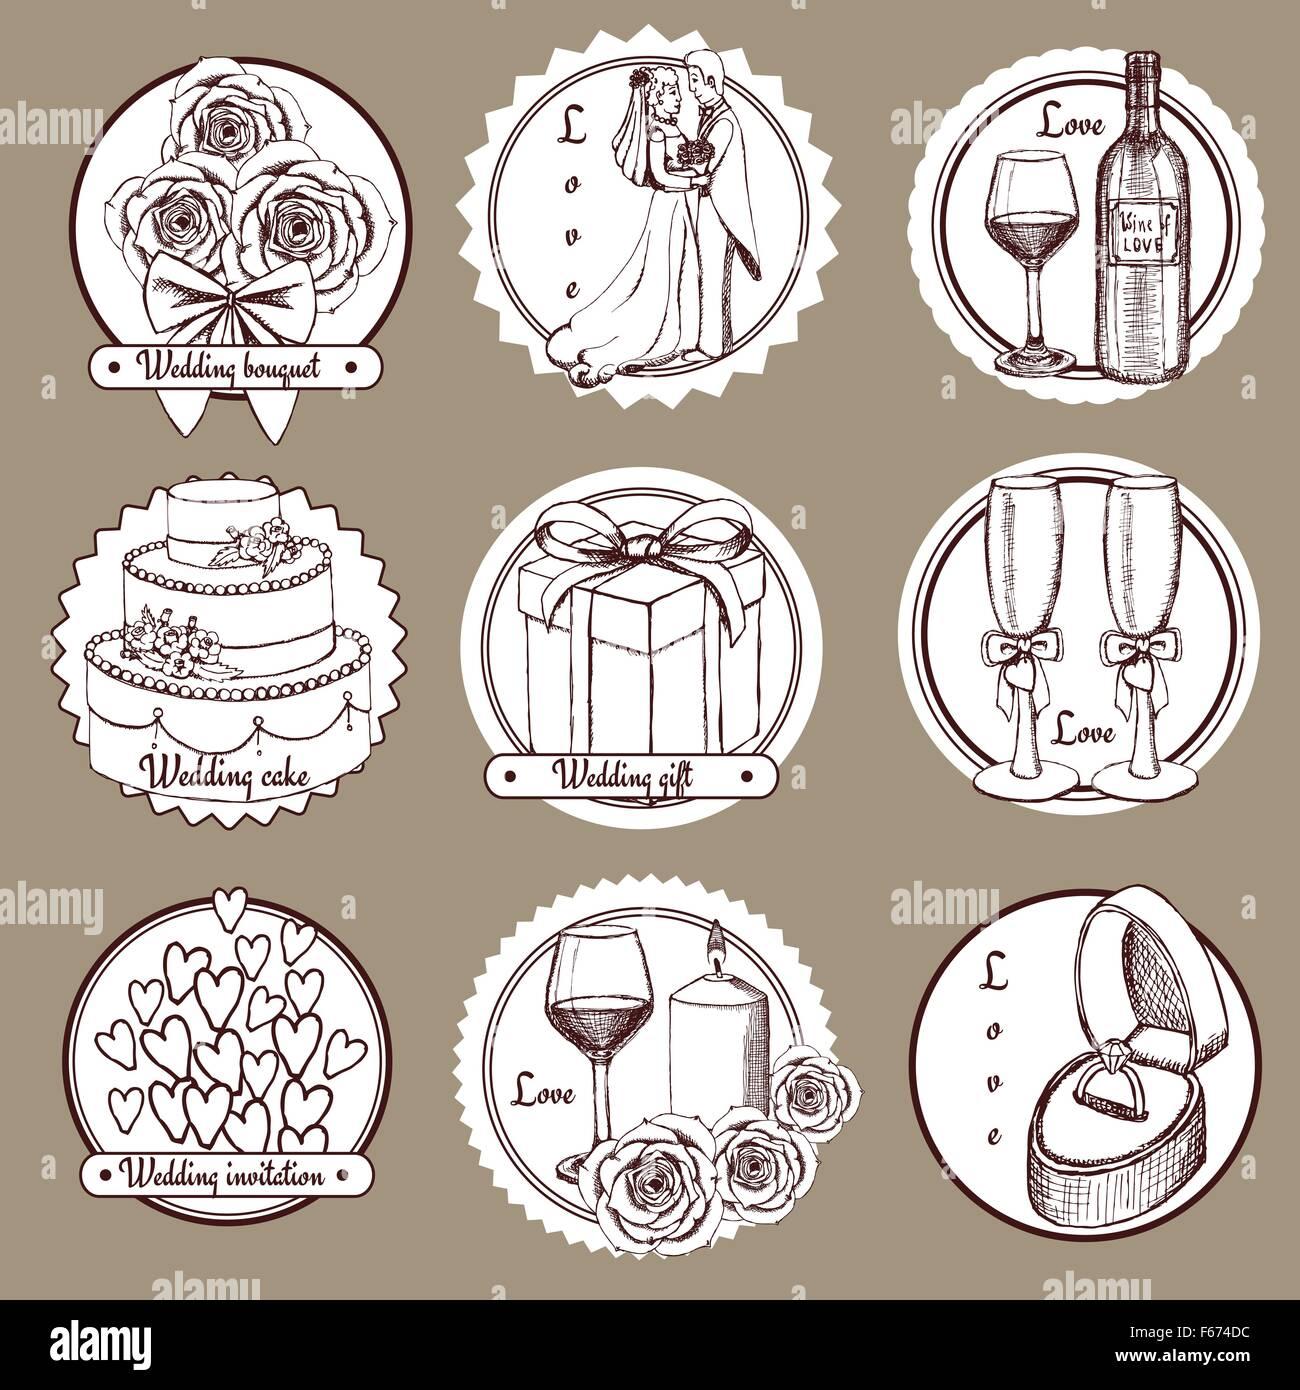 Sketch wedding logotypes in vintage style, vector - Stock Image